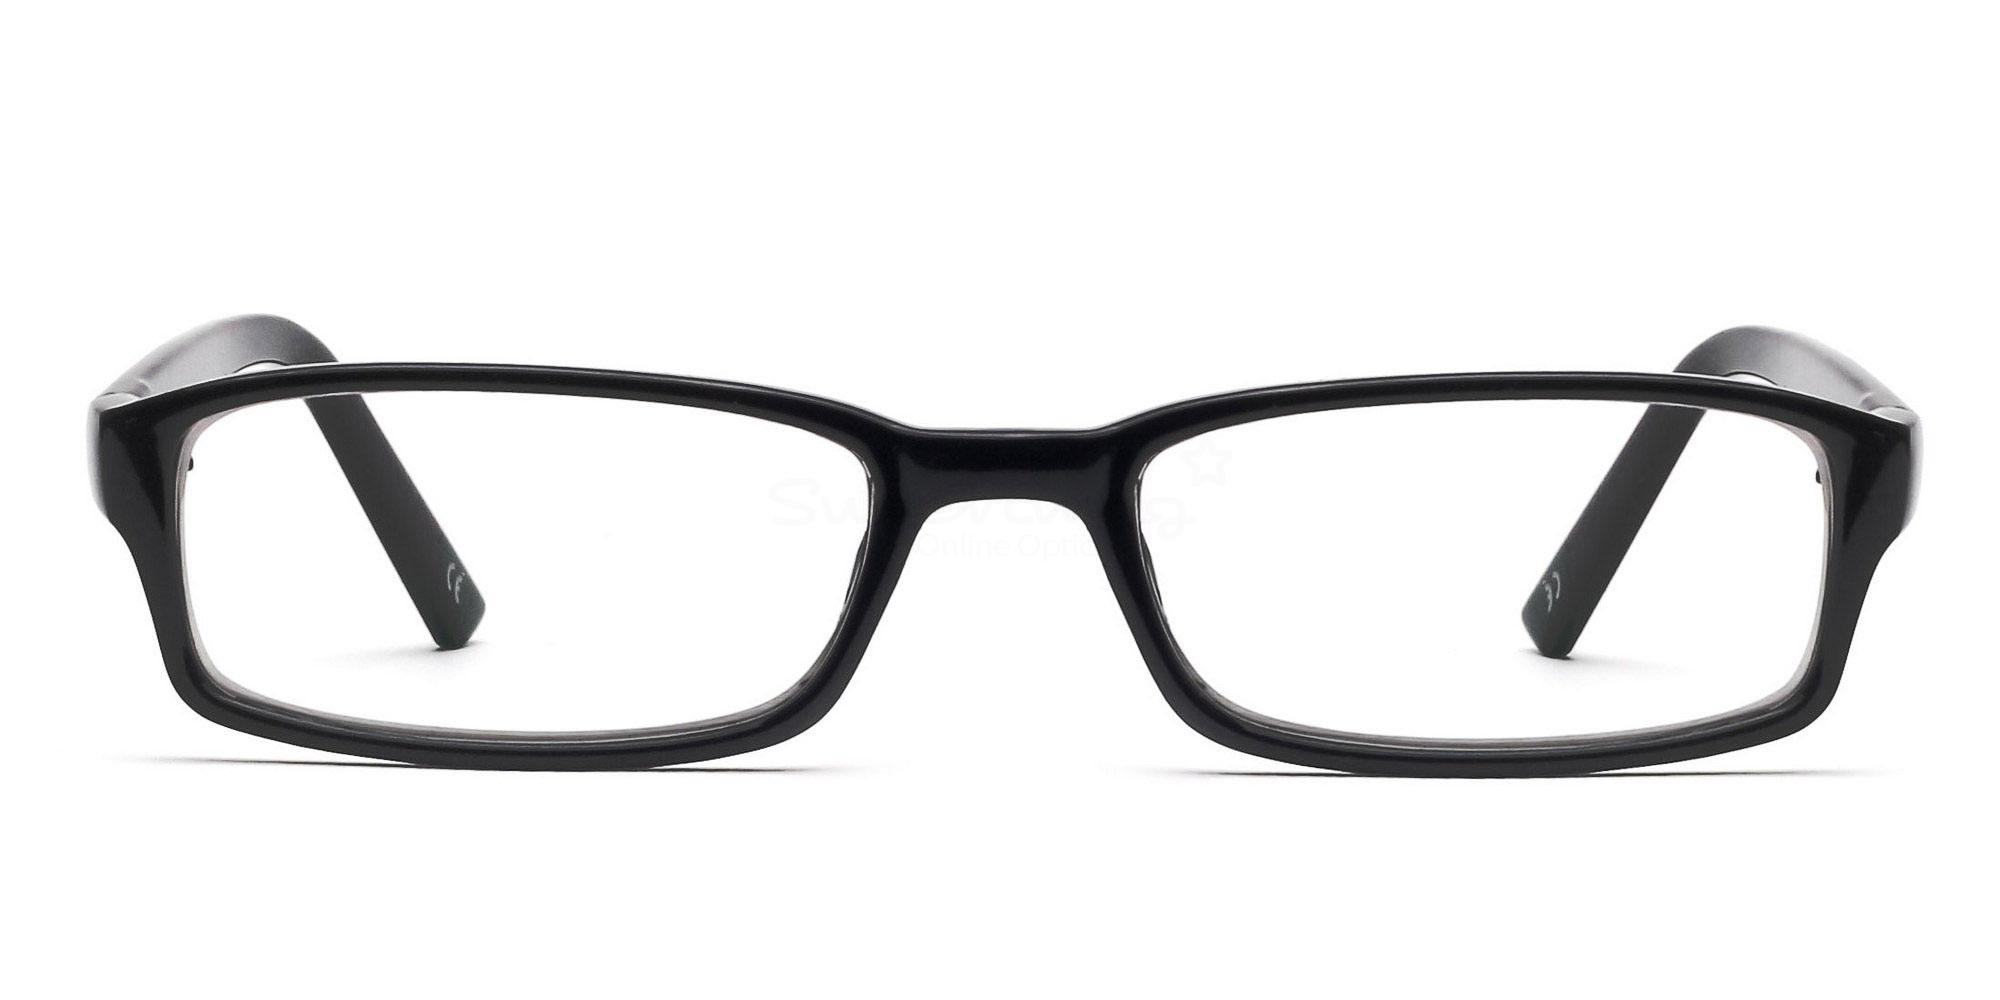 COL.01 2264 - Black Glasses, Helium